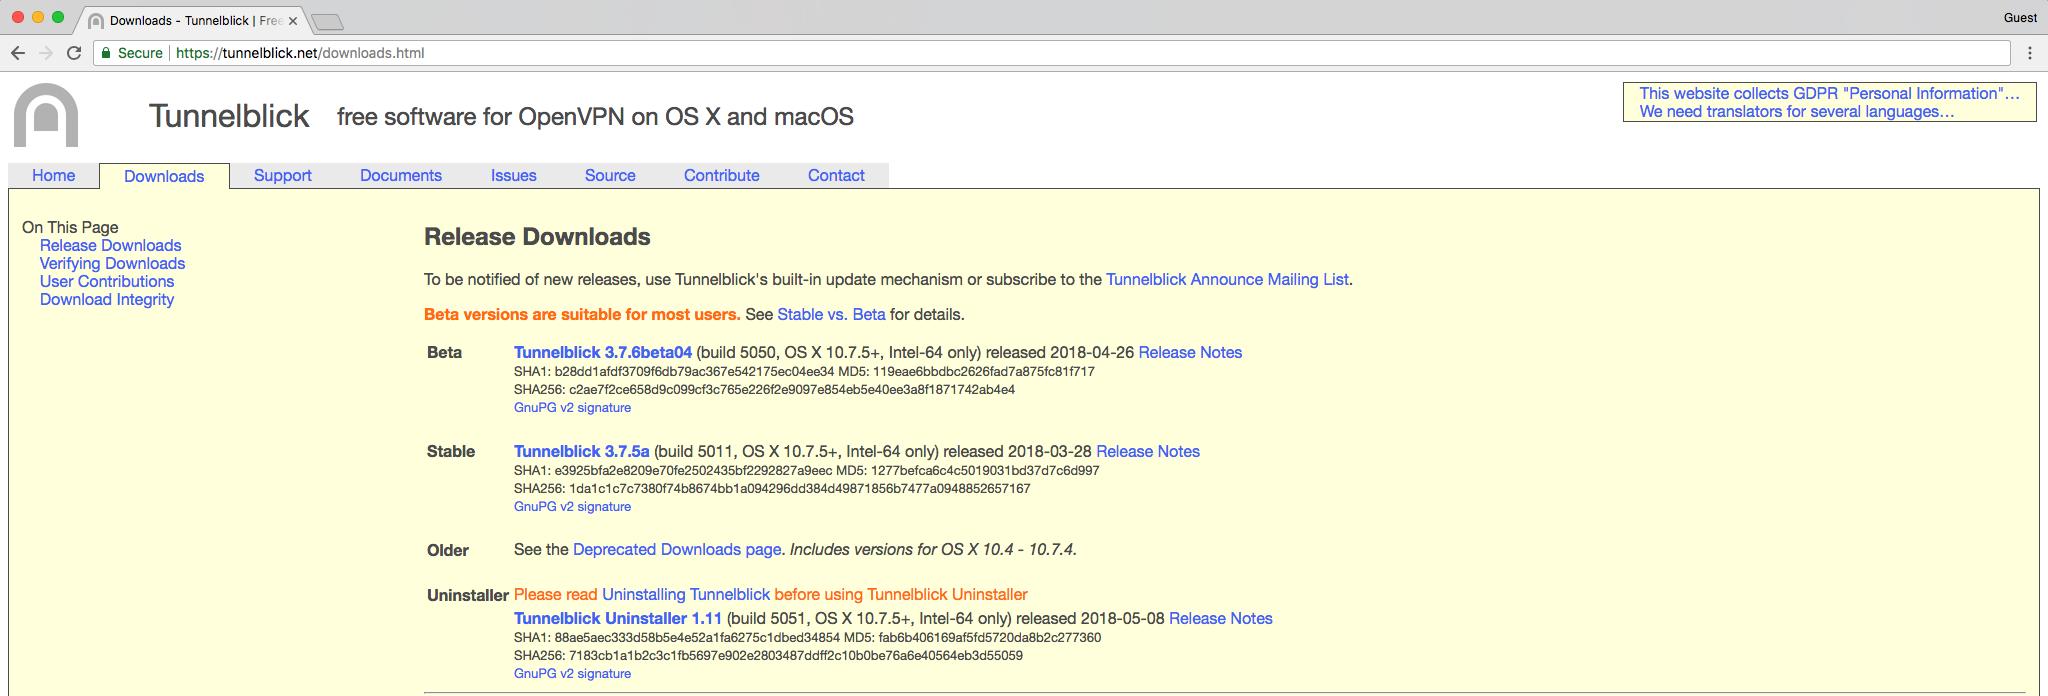 Cloudify Labs VPN Configuration Guide - cloudify